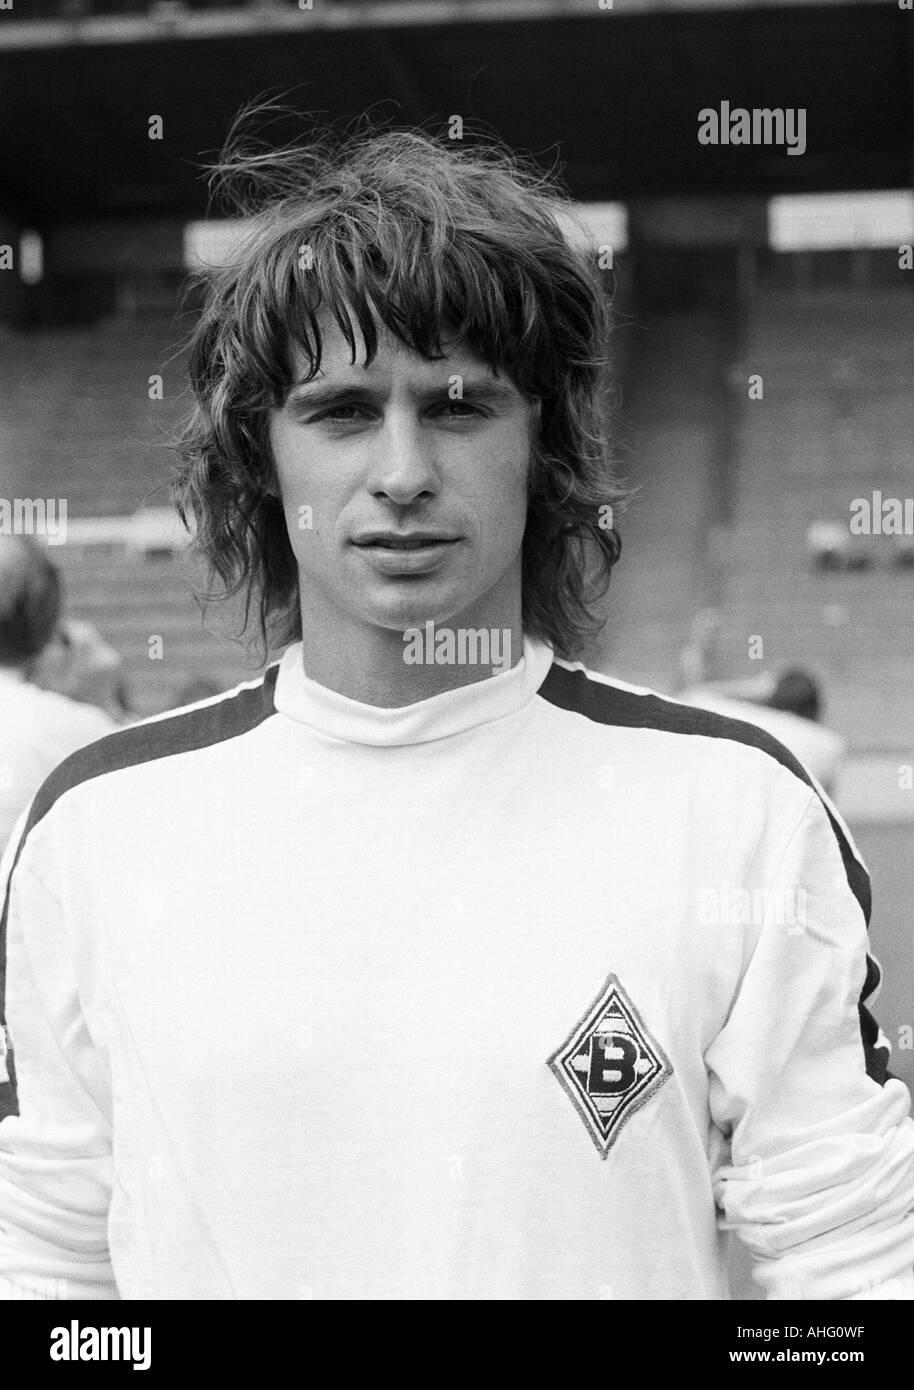 football, Bundesliga, Borussia Moenchengladbach, presentation of the team for the new saison 1975/1976, press photo shooting, portrait of Horst Wohlers - Stock Image